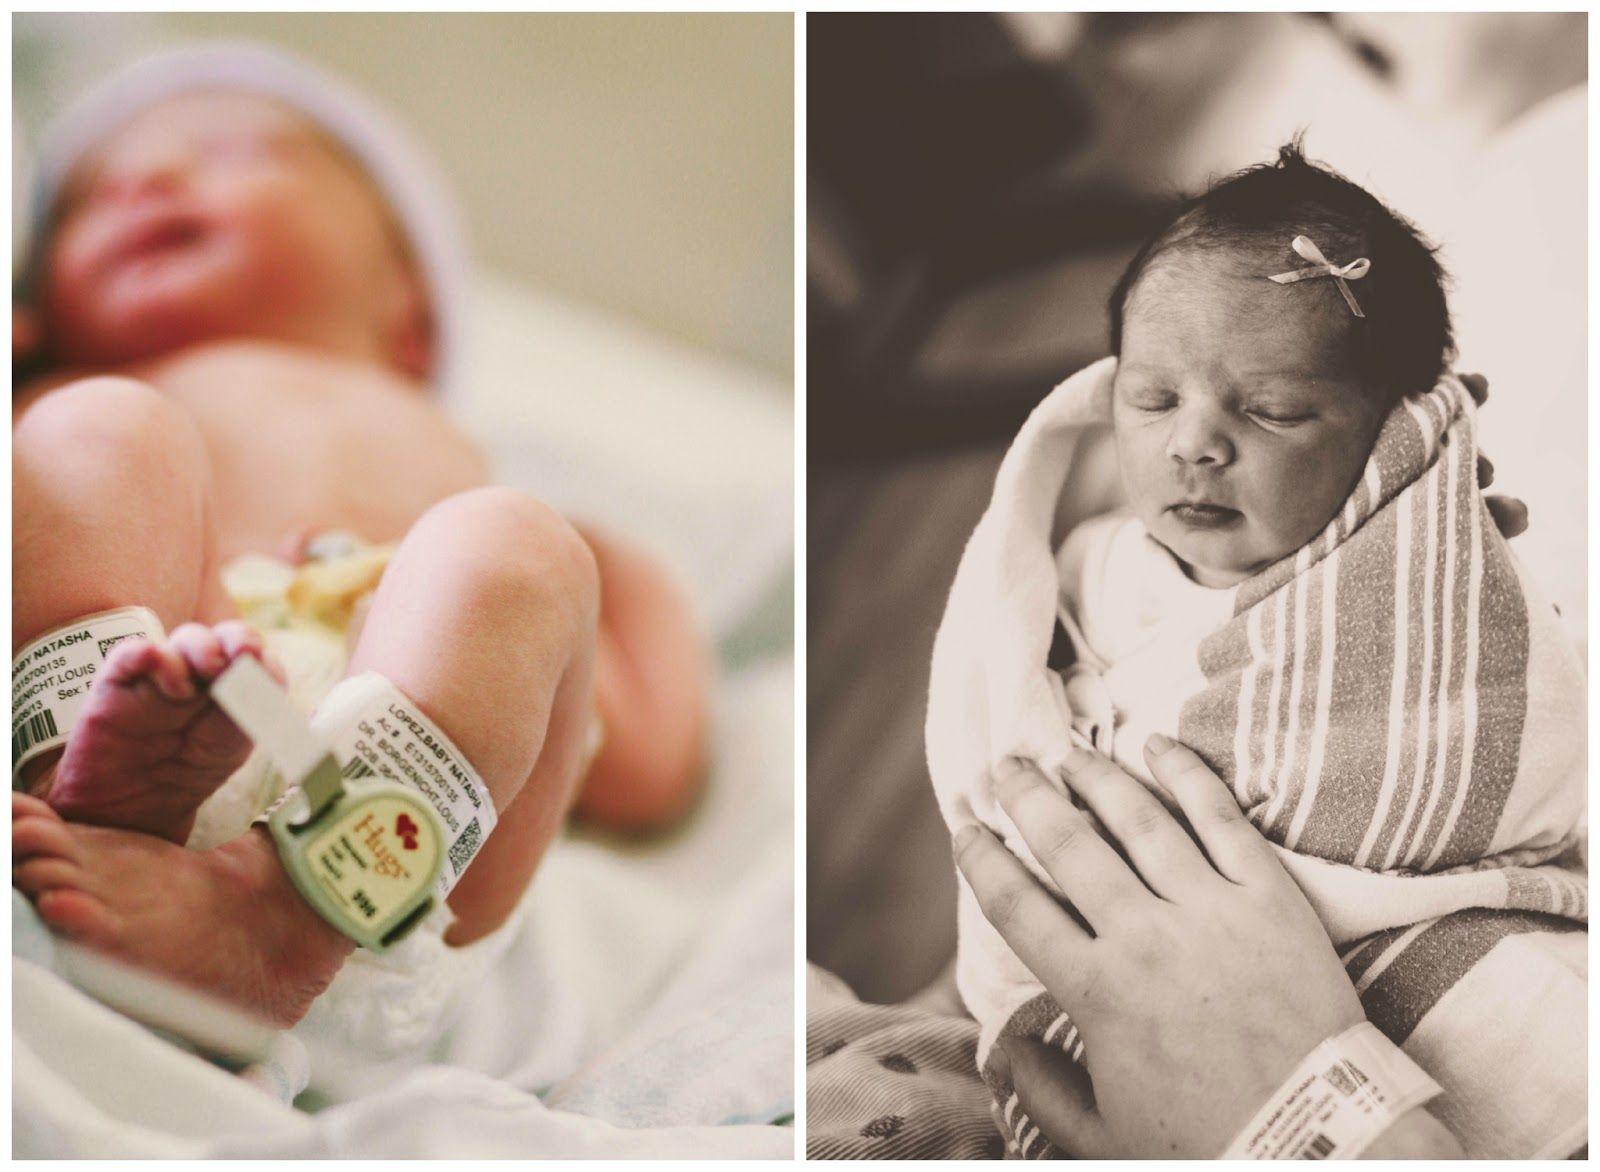 london photography birth story Birth photography